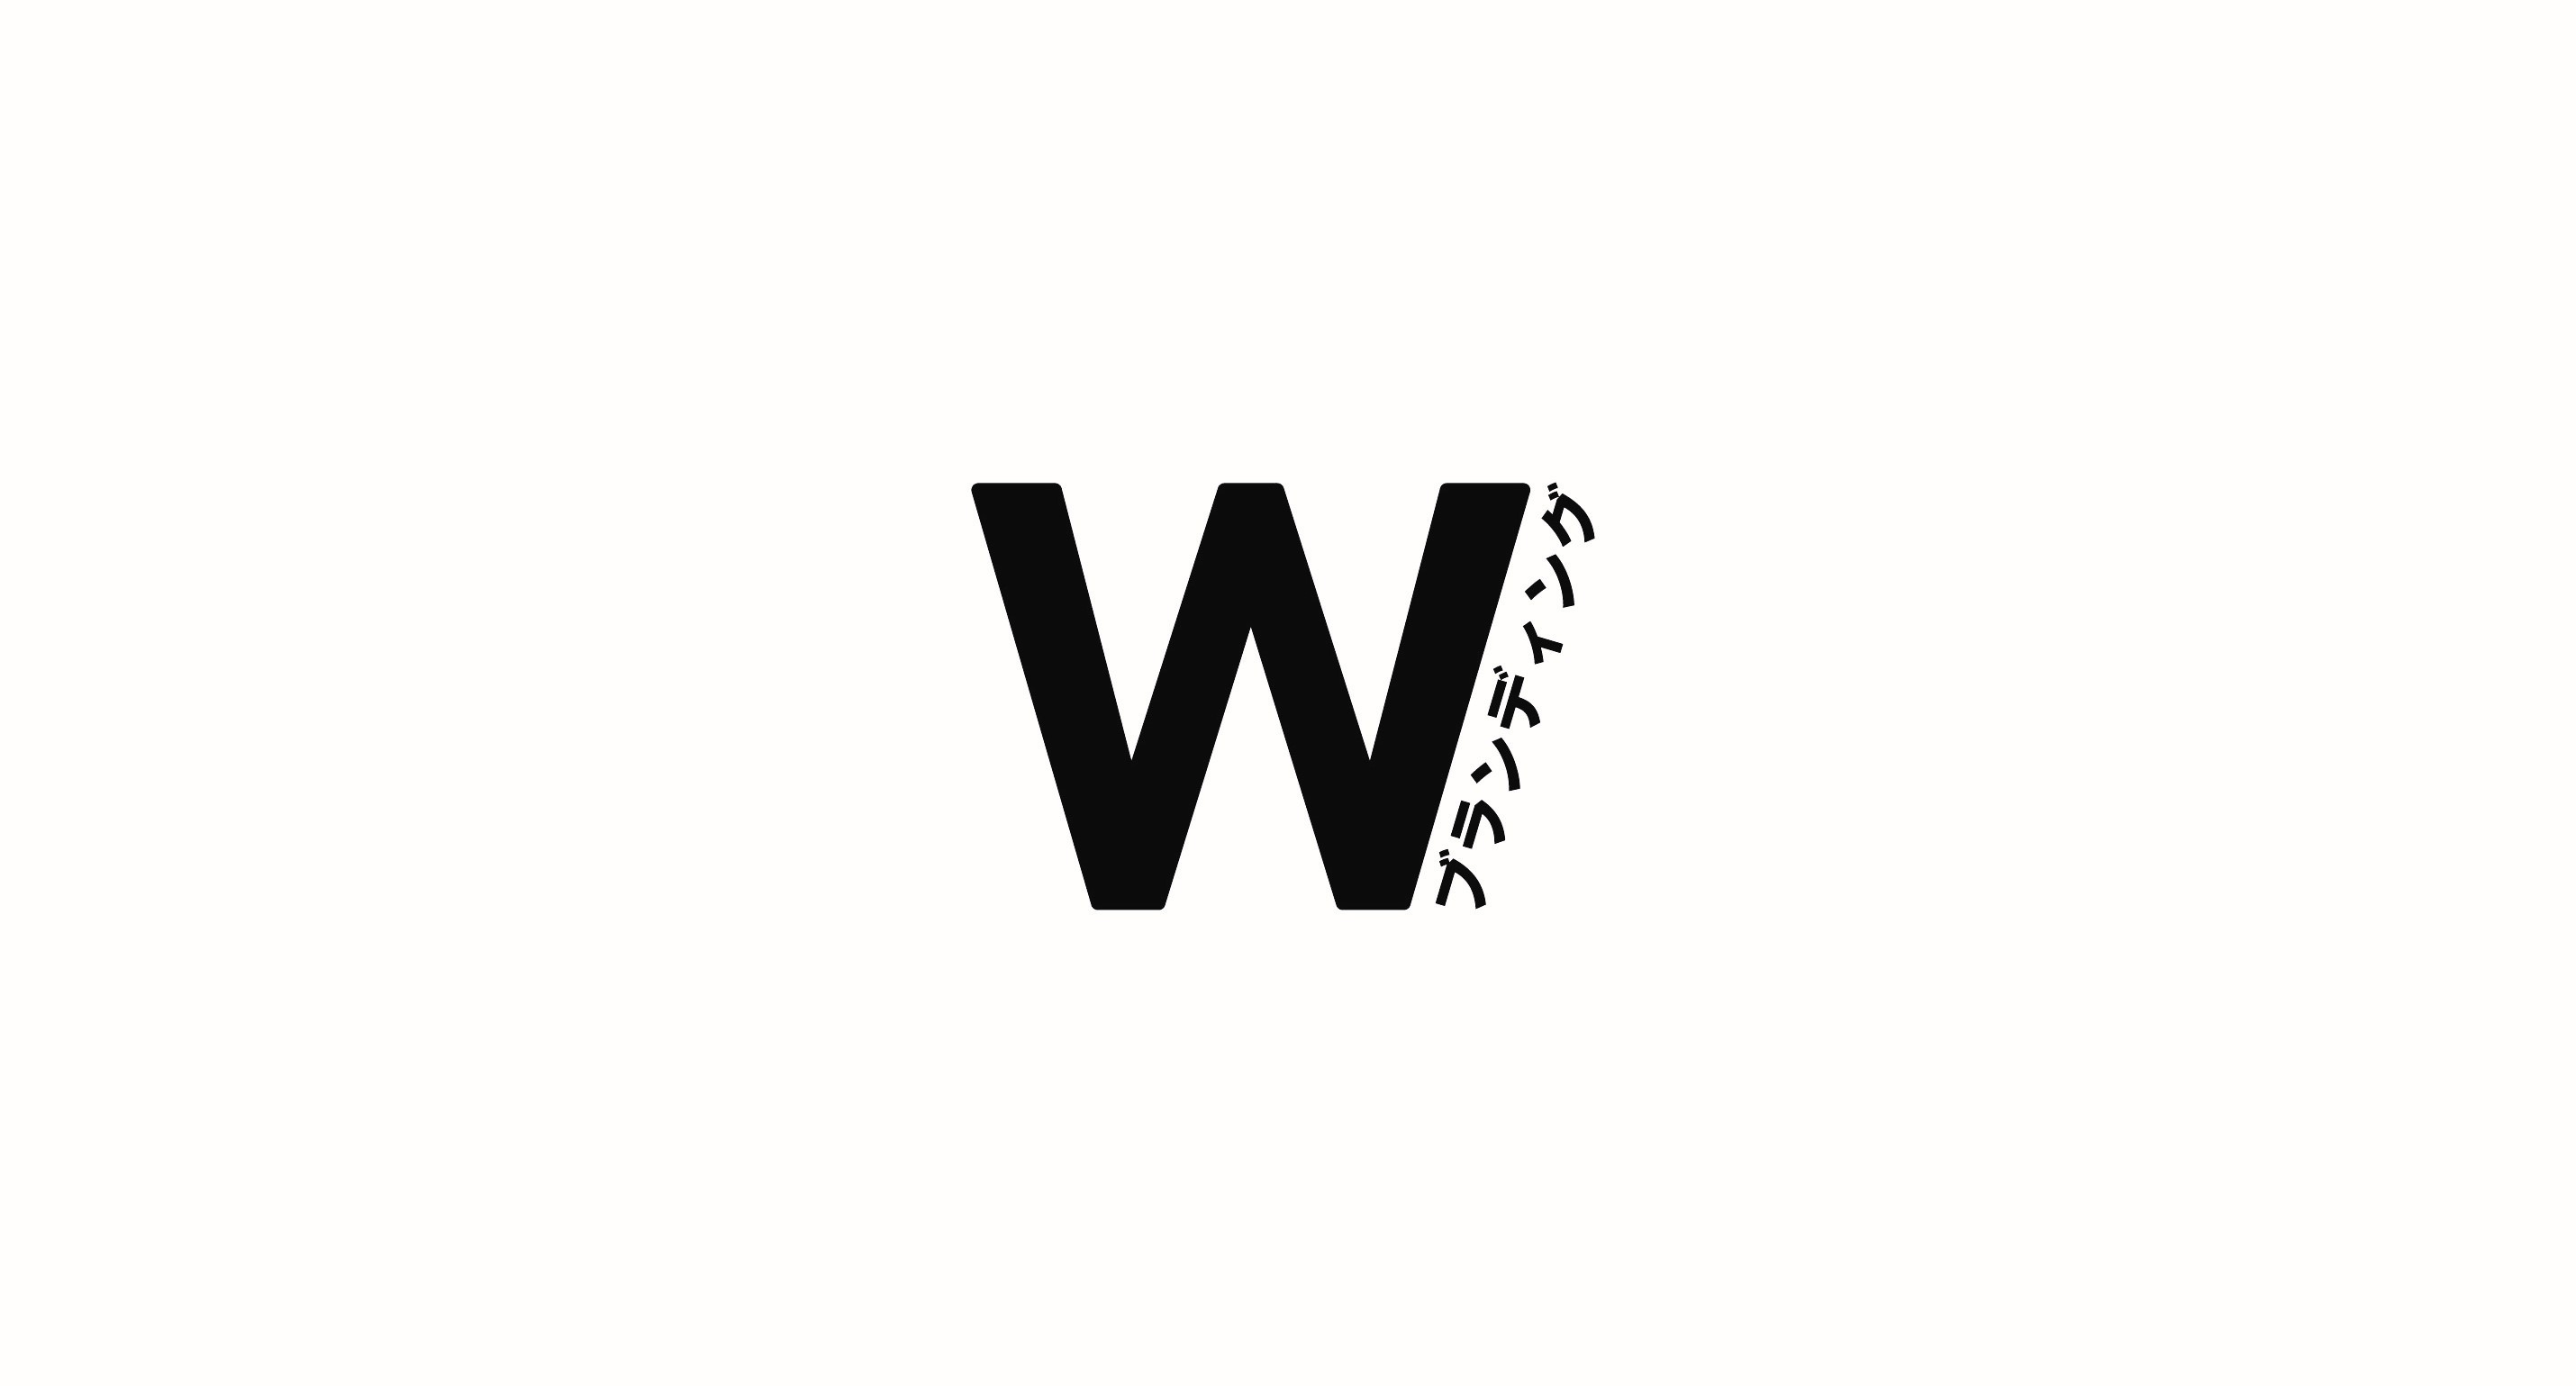 Wブランディング株式会社 -異彩を放つブランド化戦略‐